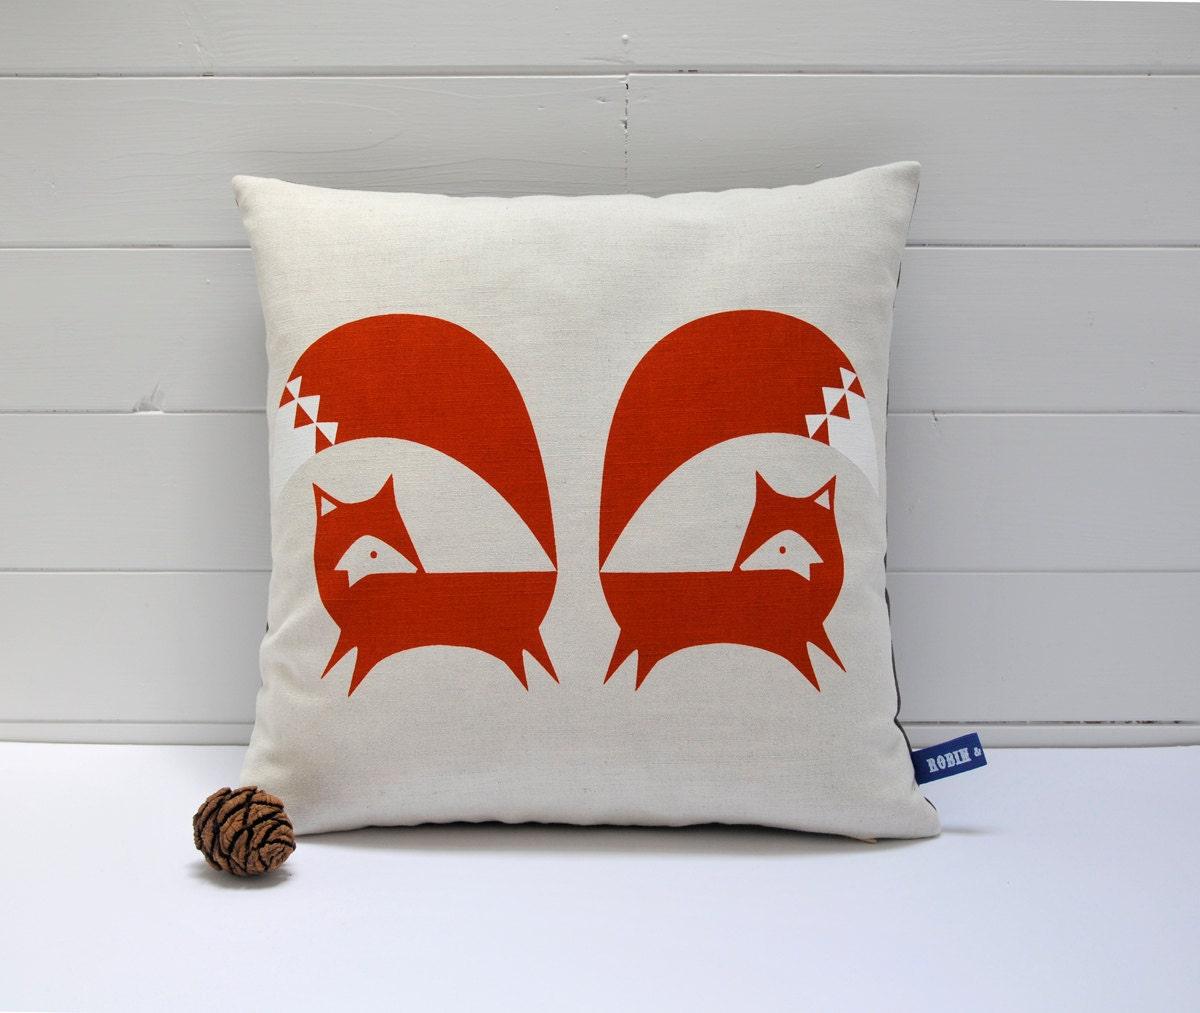 Hand Screen Printed Fox Cushion Cover in Burnt Orange